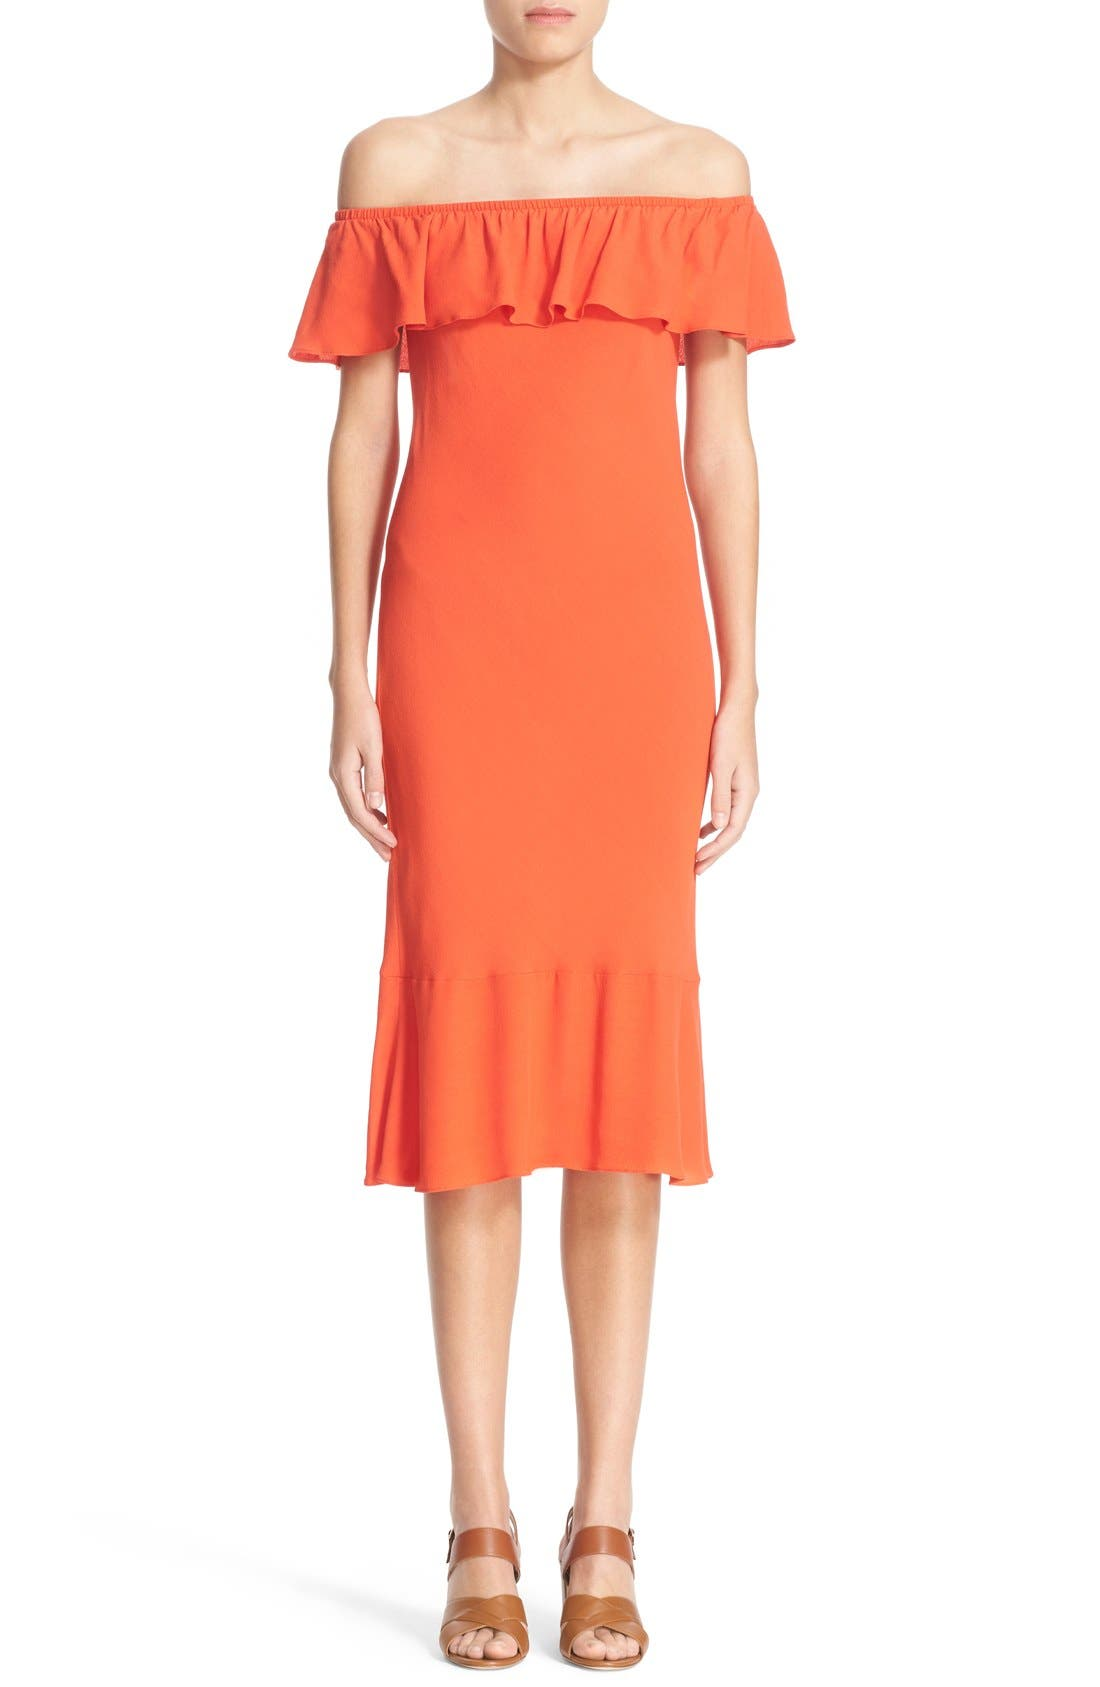 Main Image - Veronica Beard 'Oleta' Ruffle Off the Shoulder Dress